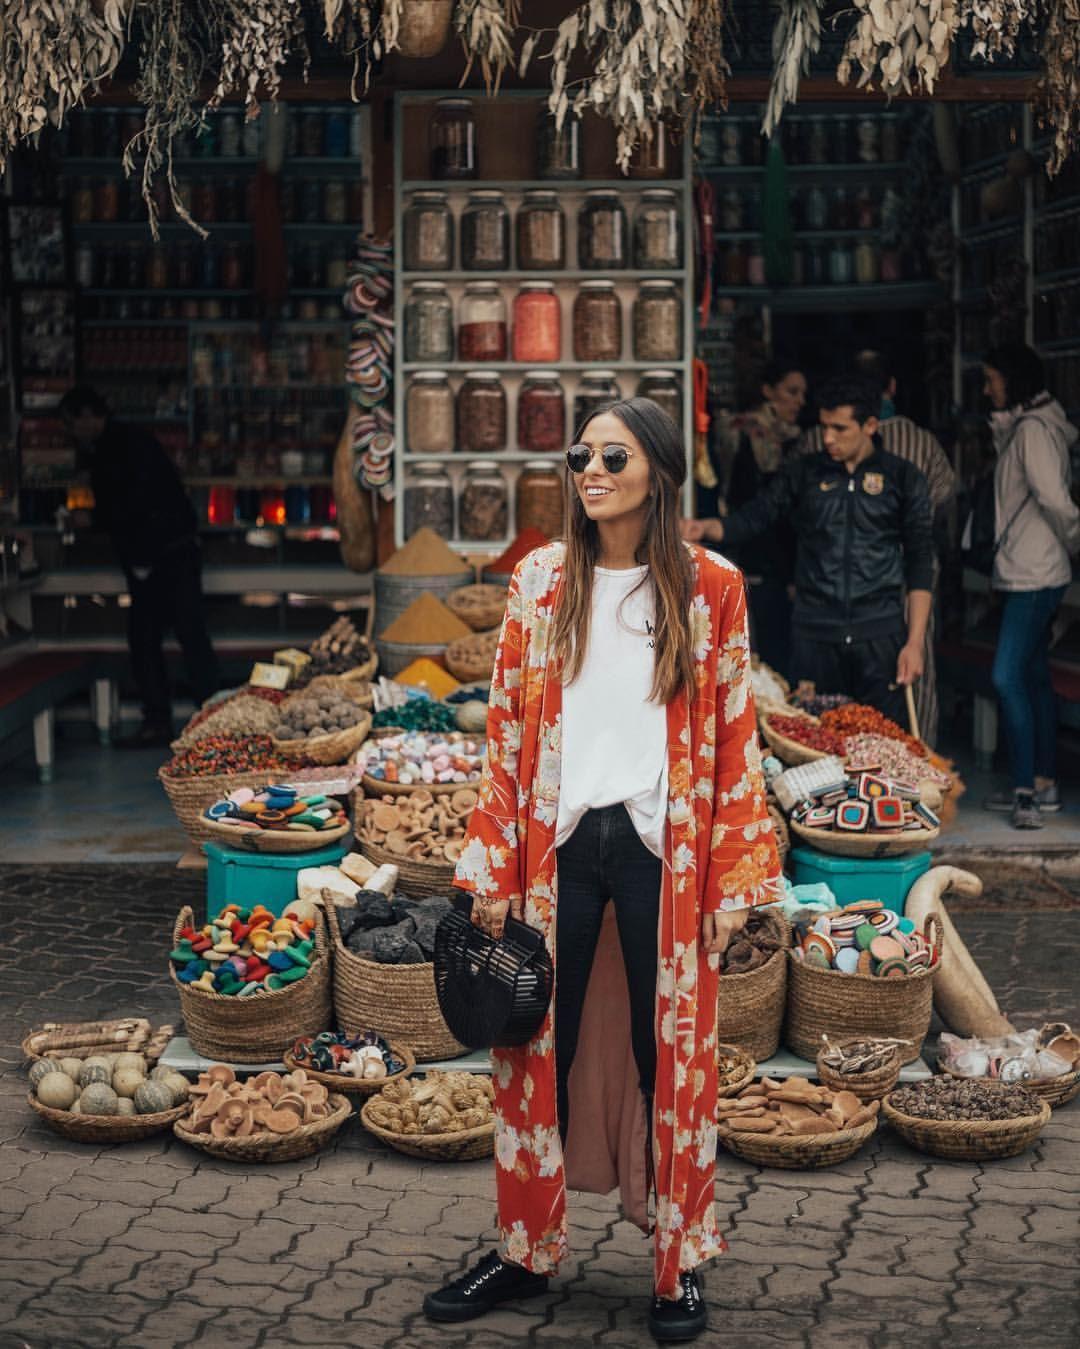 #marokkó - Интересное